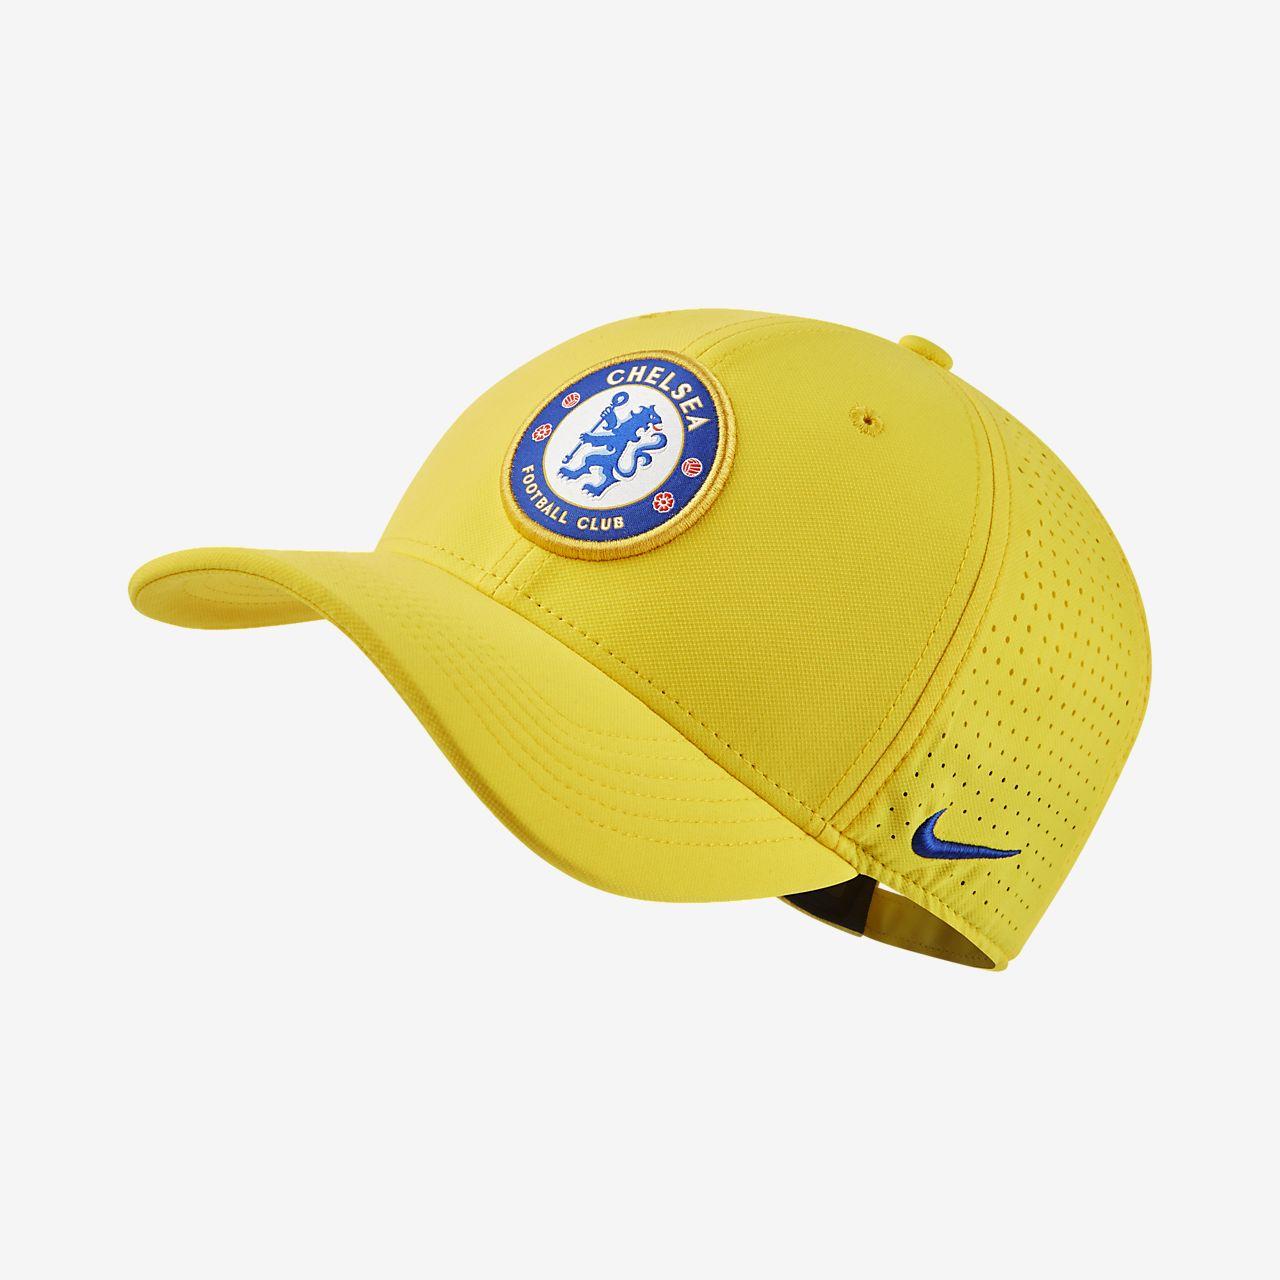 e7b900eabf1 Chelsea FC AeroBill Classic99 Adjustable Hat. Nike.com AU